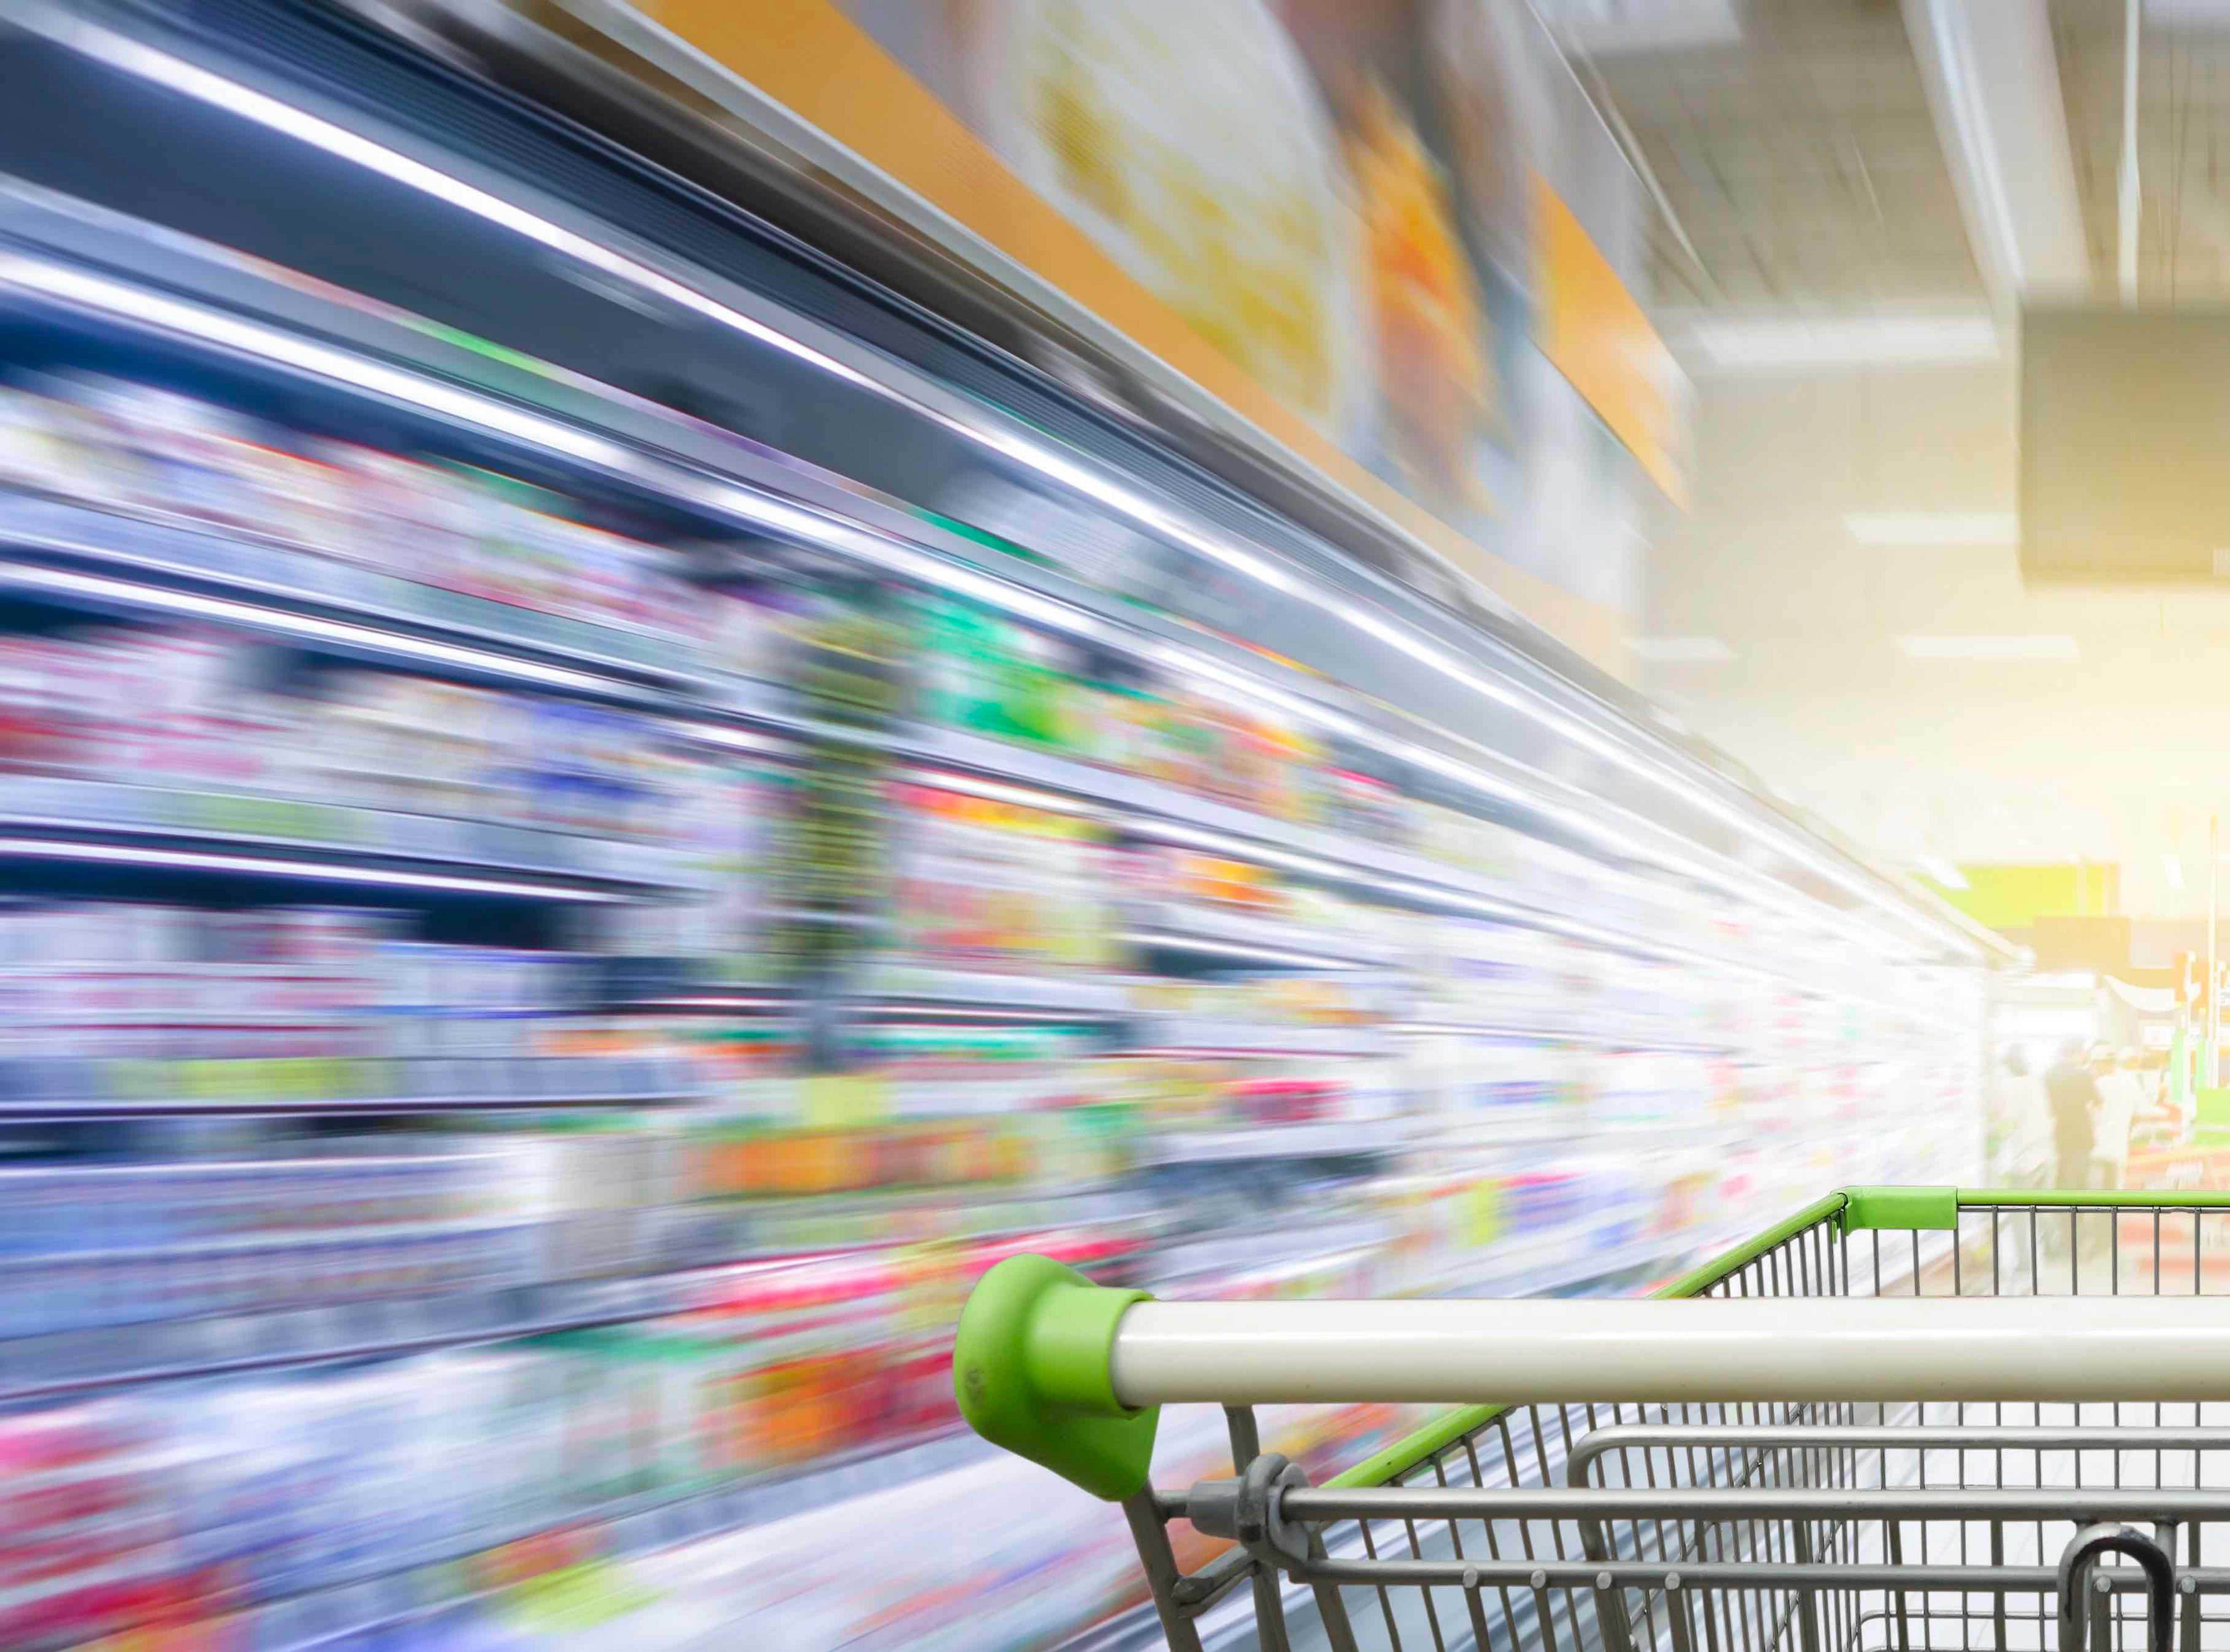 Accruent - Resources - Webinars - Maintenance Management for European Food Retailers - Hero